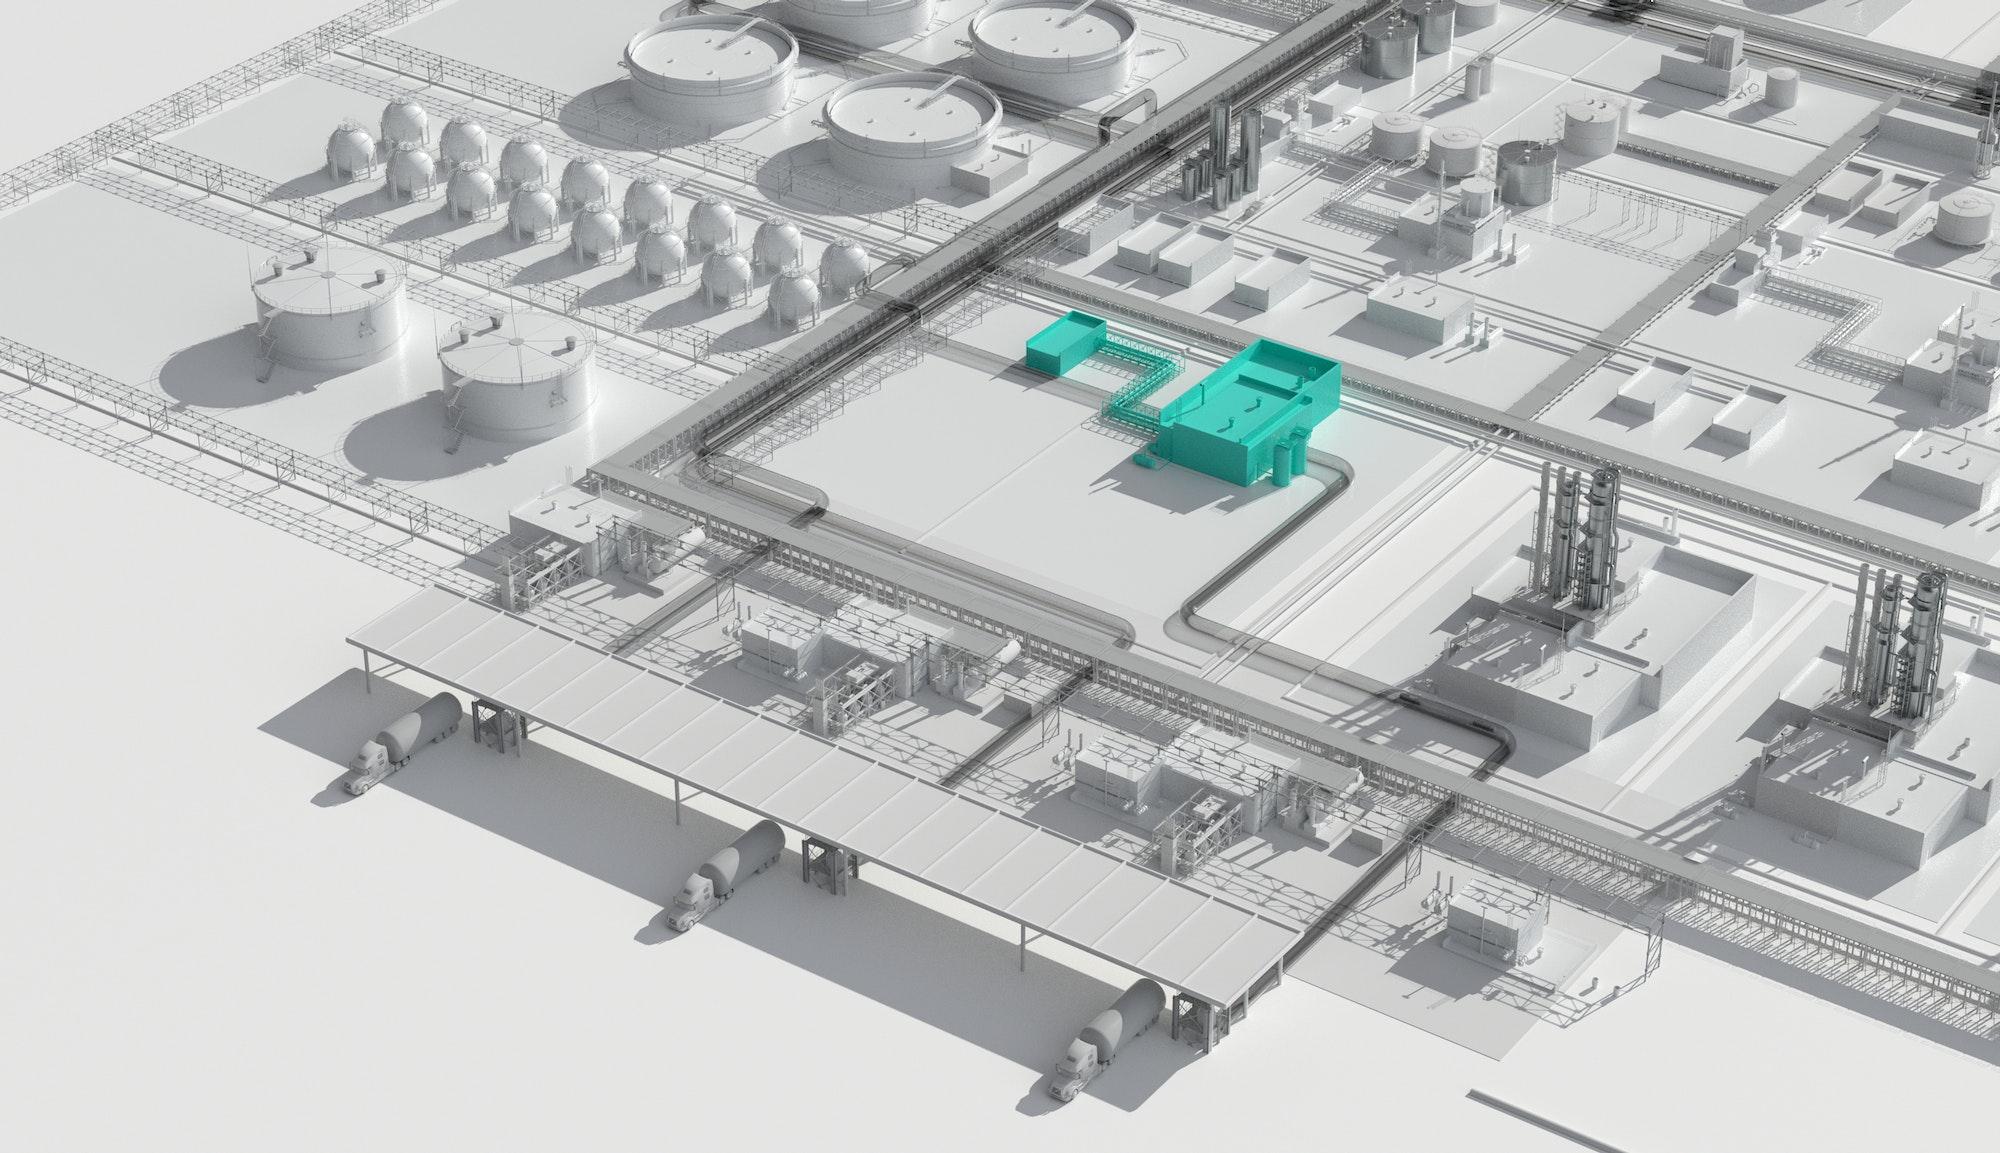 Hydrogen co-production